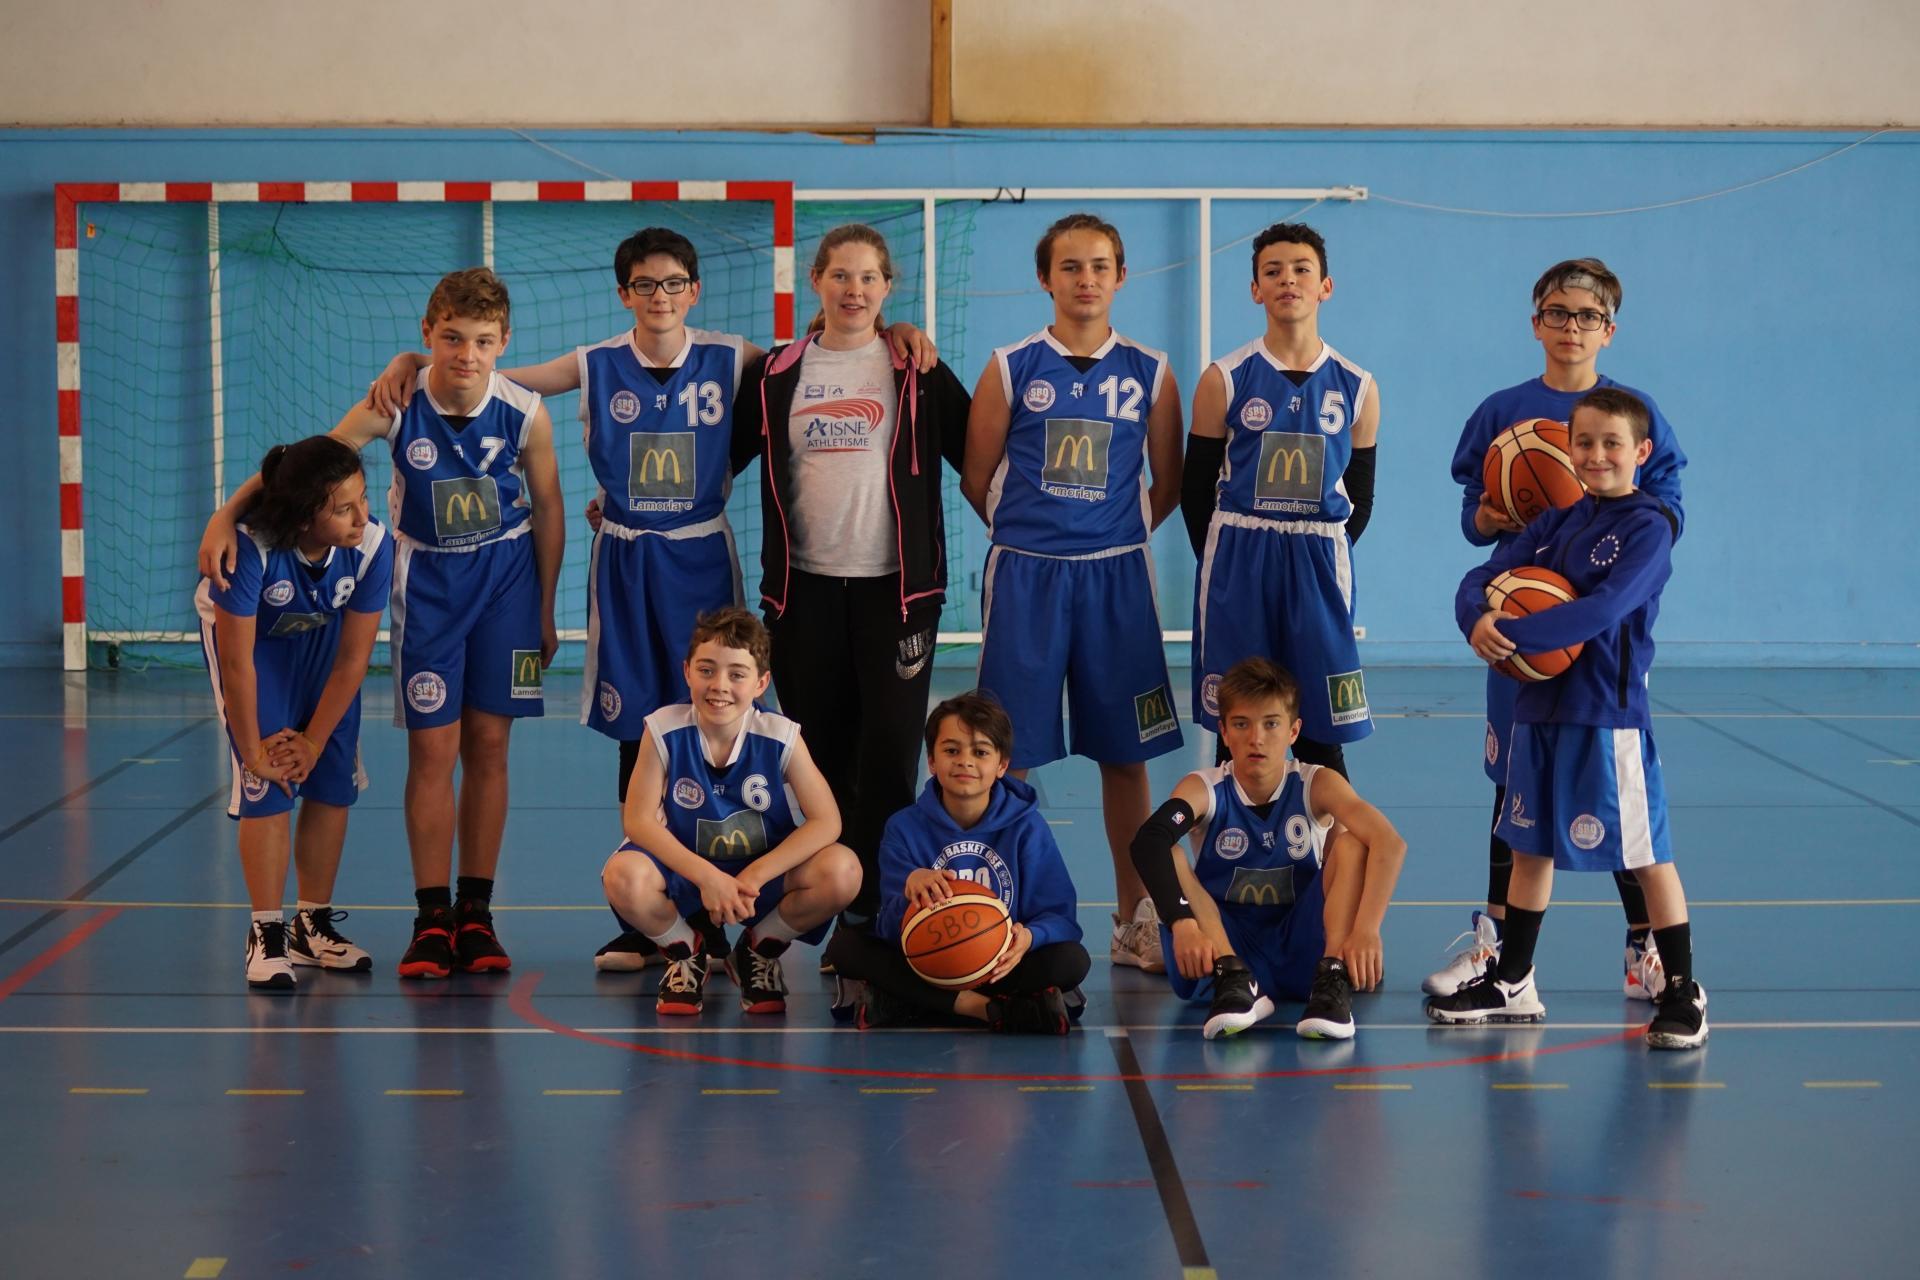 U13 Sud Basket Oise Saison 2018-2019